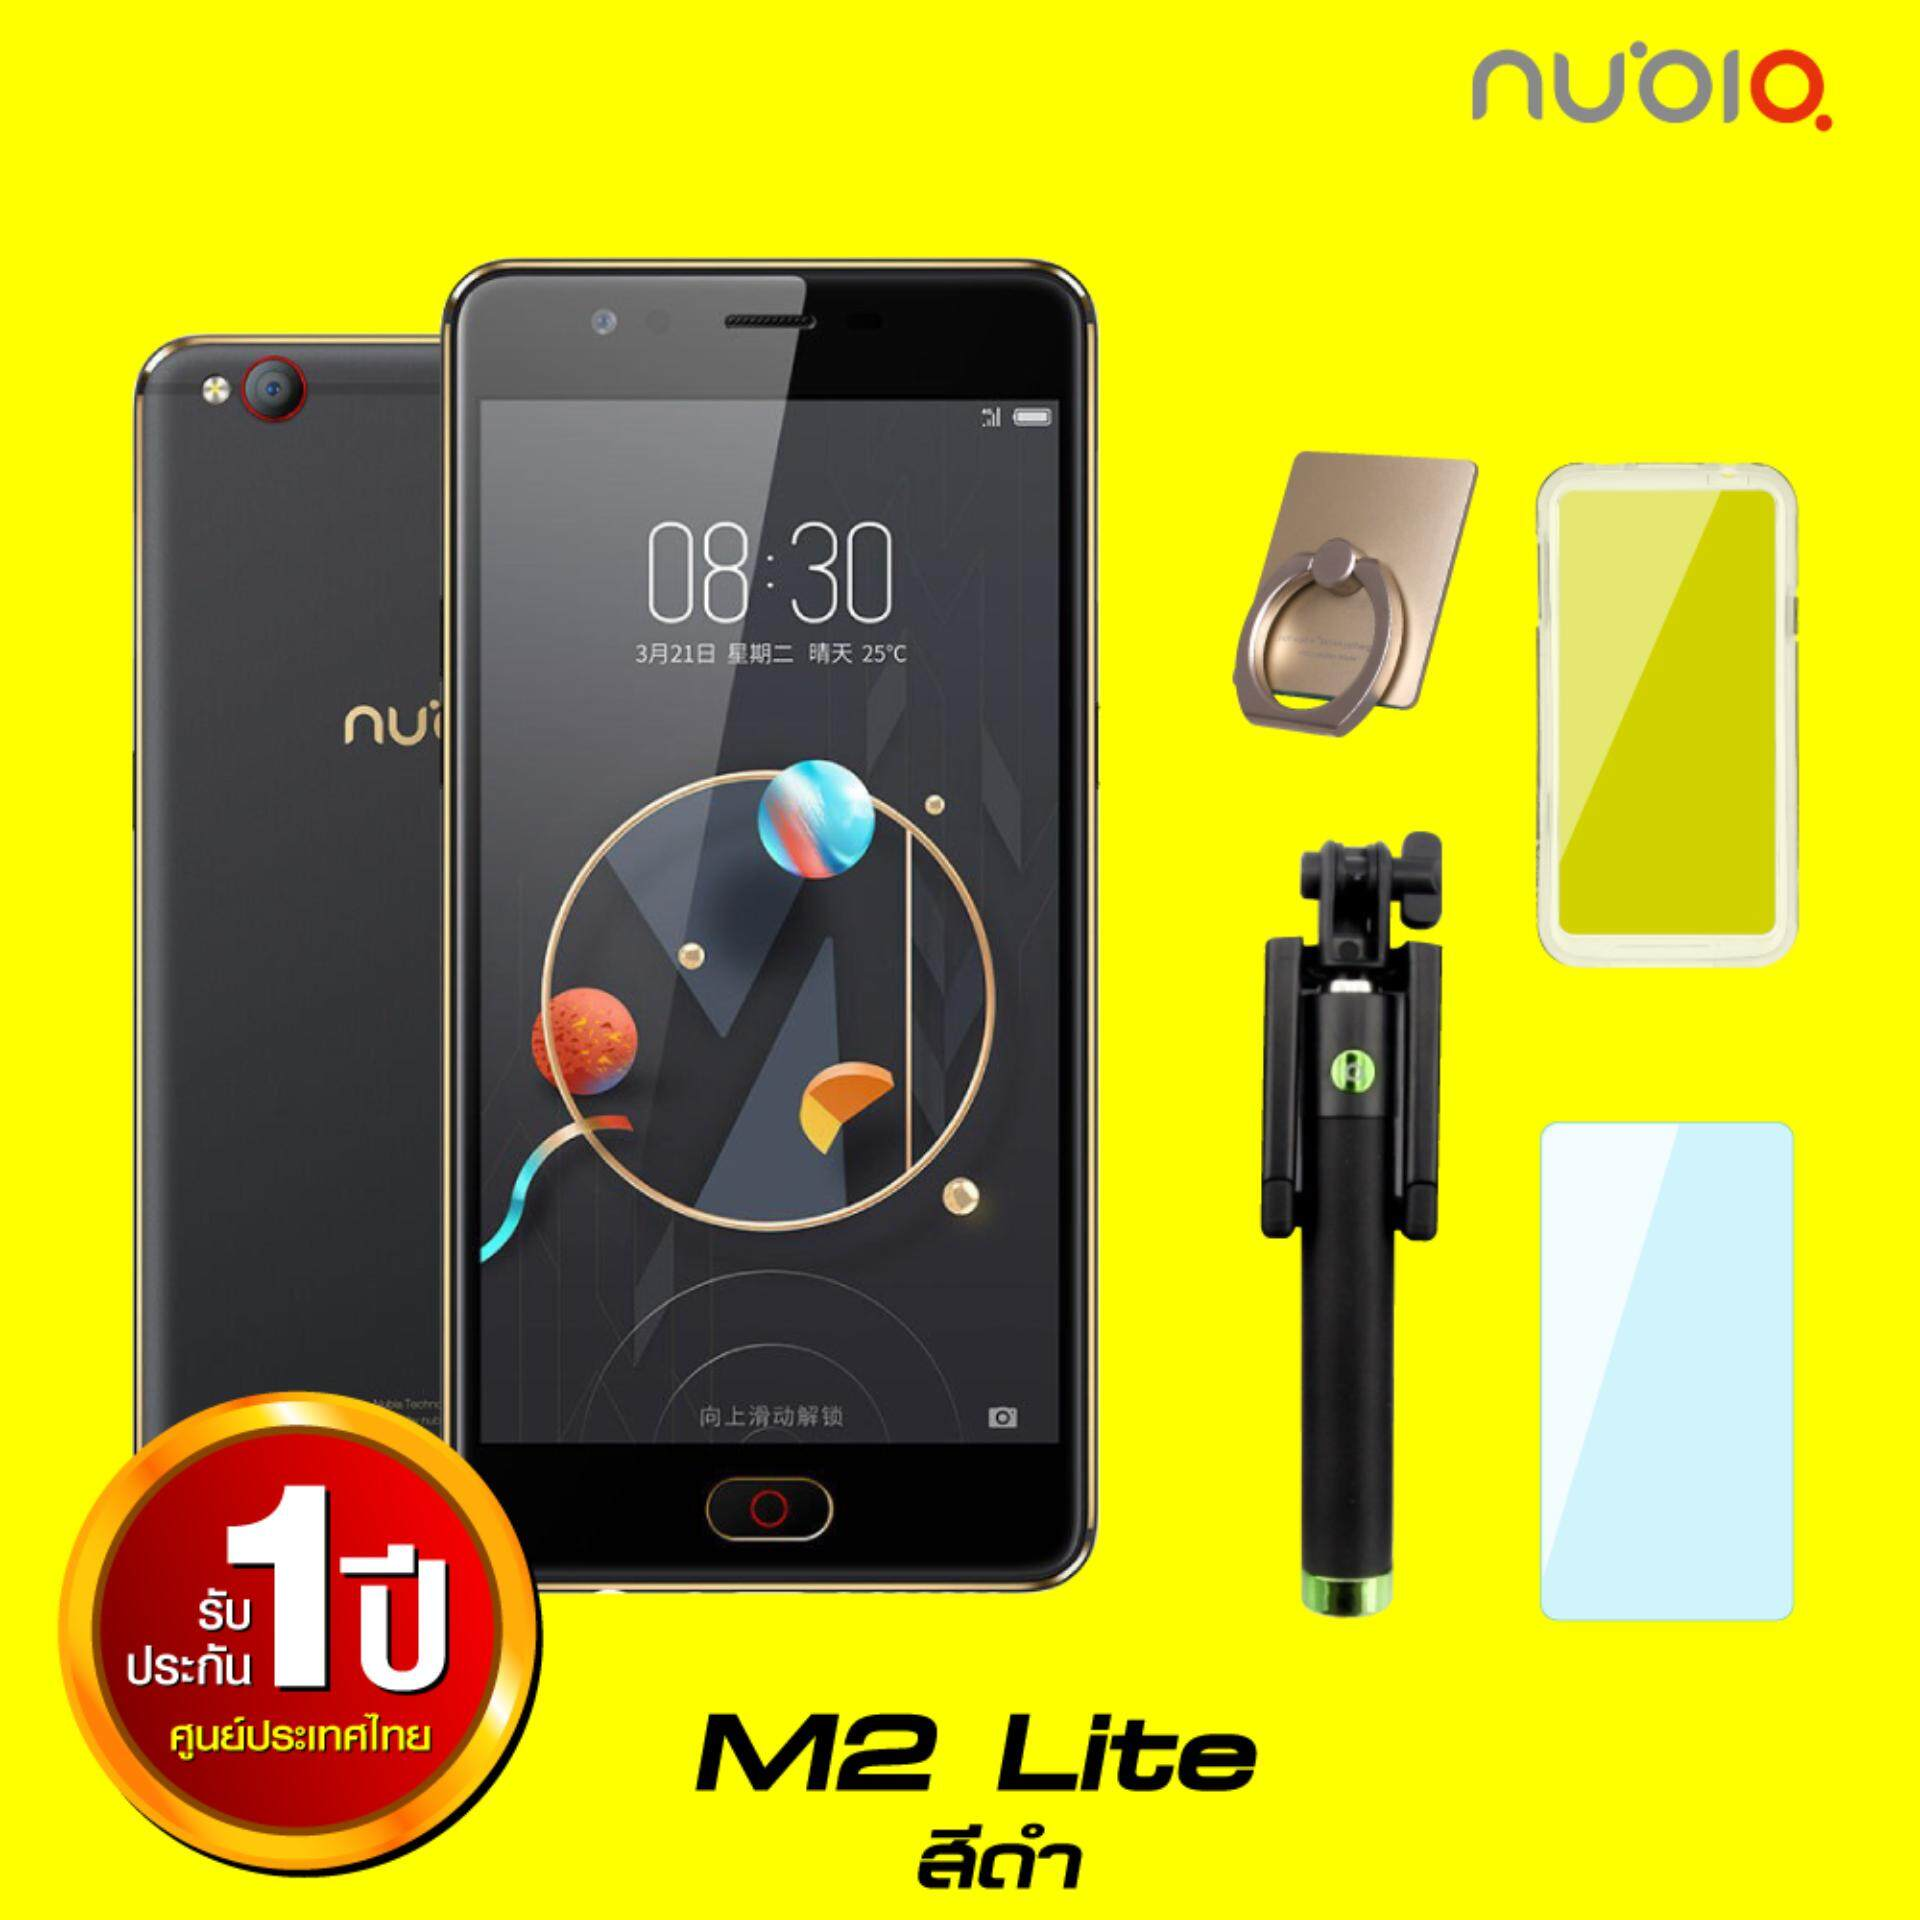 Nubia M2 Lite (4/32GB) พร้อมเคสกันกระแทก + ฟิล์มกันรอย + ไม้เซลฟี่ + แหวนจับ/ตั้งมือถือ [[ รับประกันศูนย์ไทย 1 ปี ]]